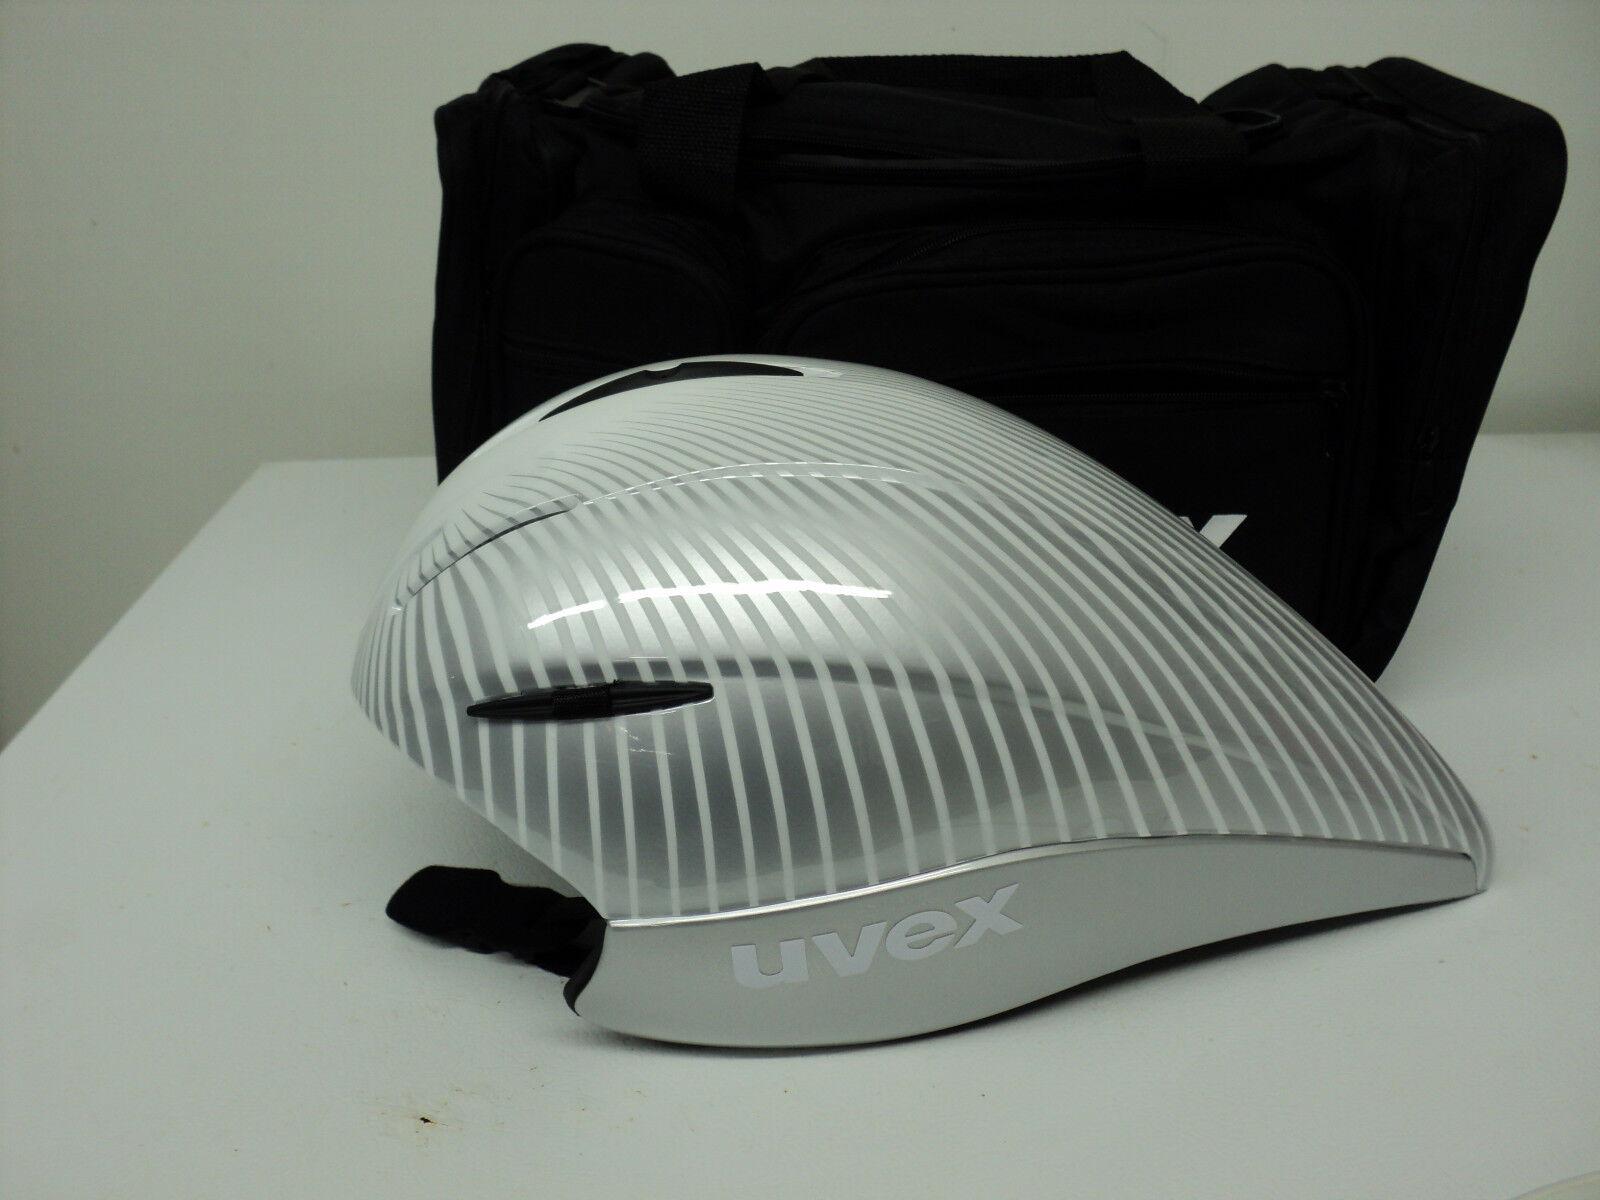 UVEX Aero Time Trial or Triathlon Helmet New  58-61cm 395g New